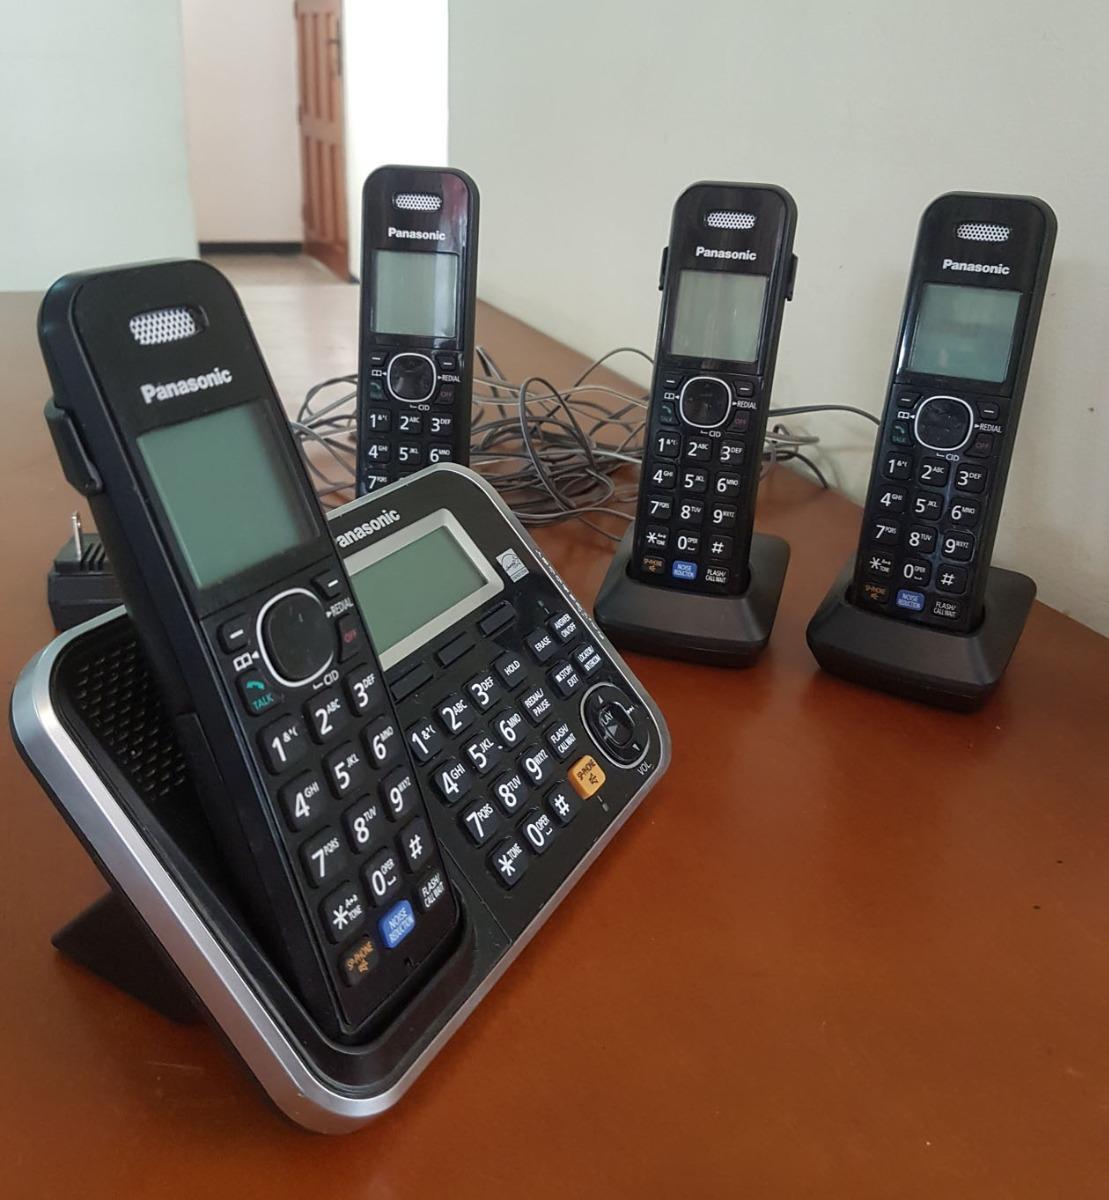 4 Telefonos Inalambricos Panasonic Kx-tg6841 + Contestadora - Bs  49 500,00